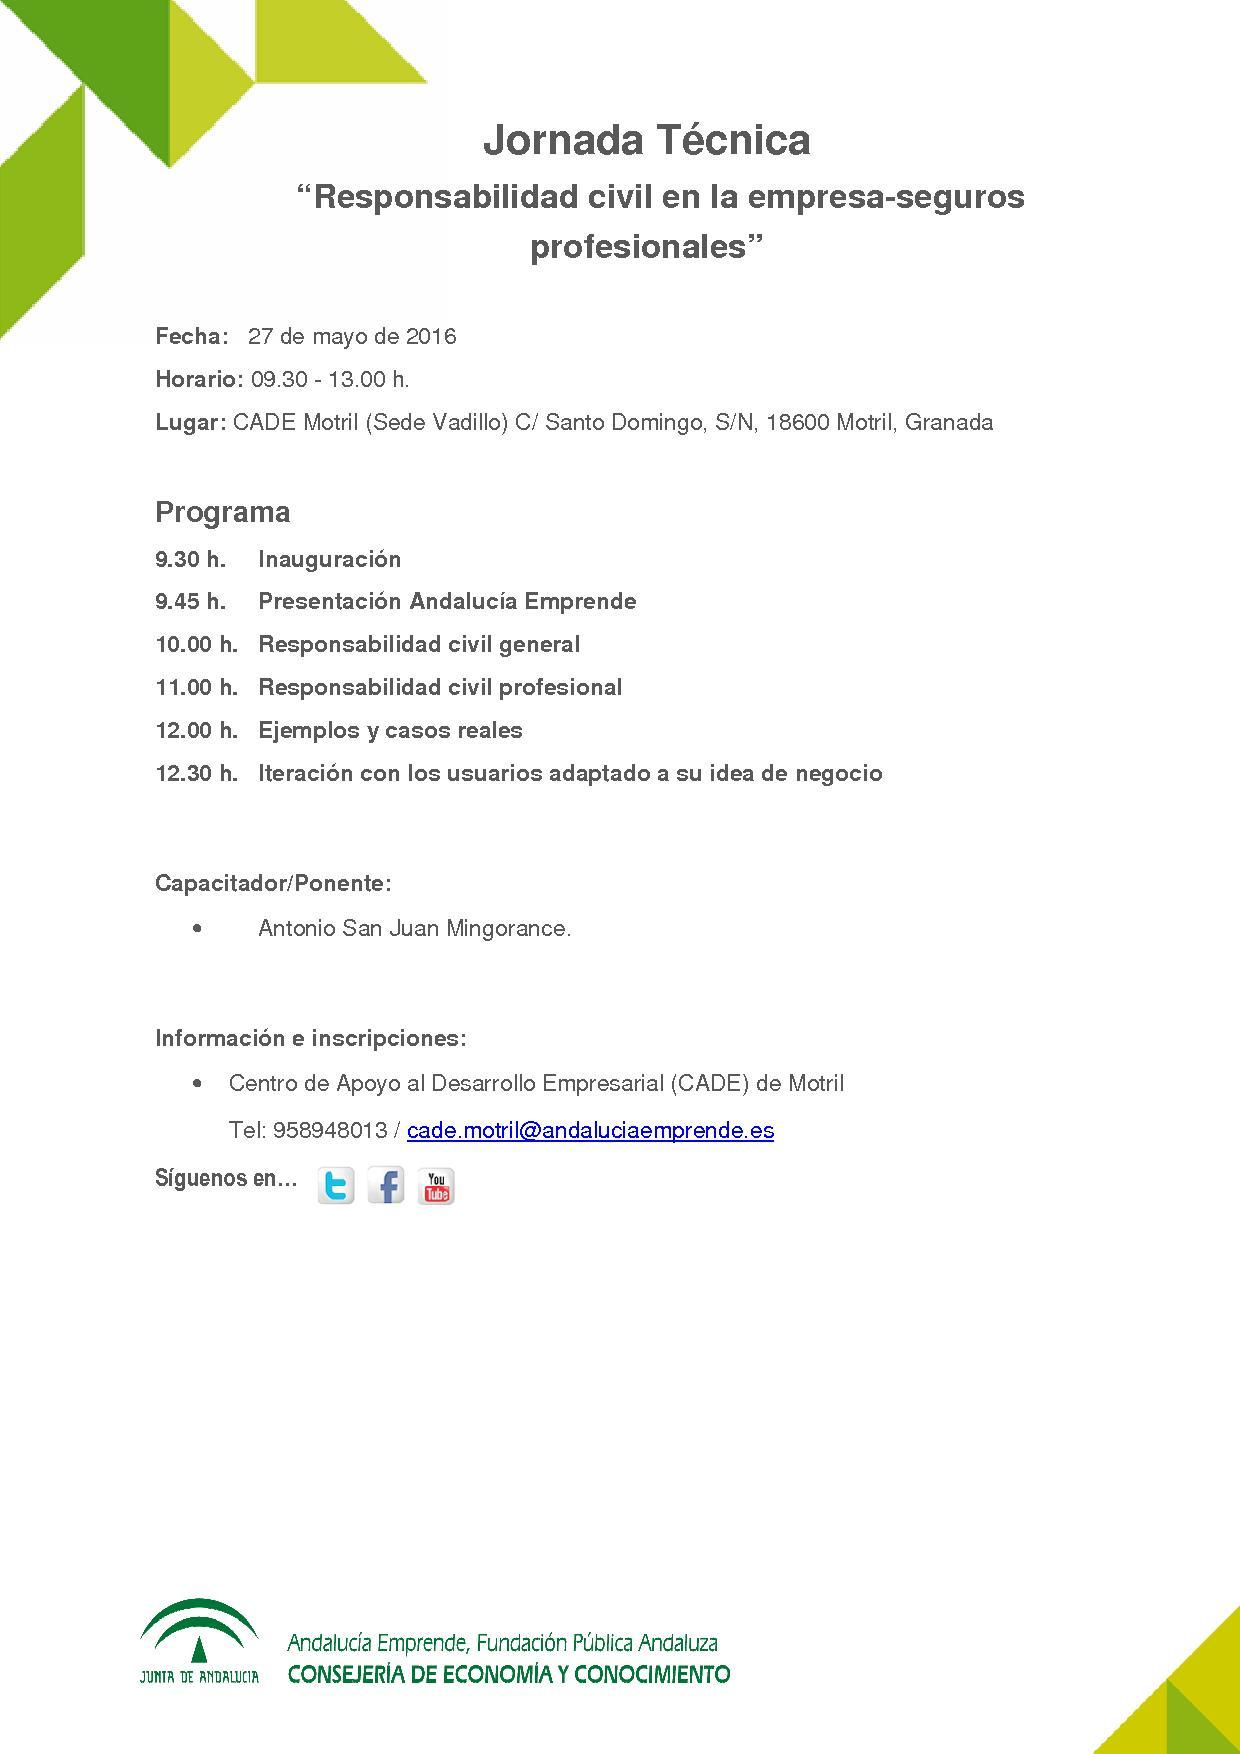 Jornada Responsabilidad Civil Empresas